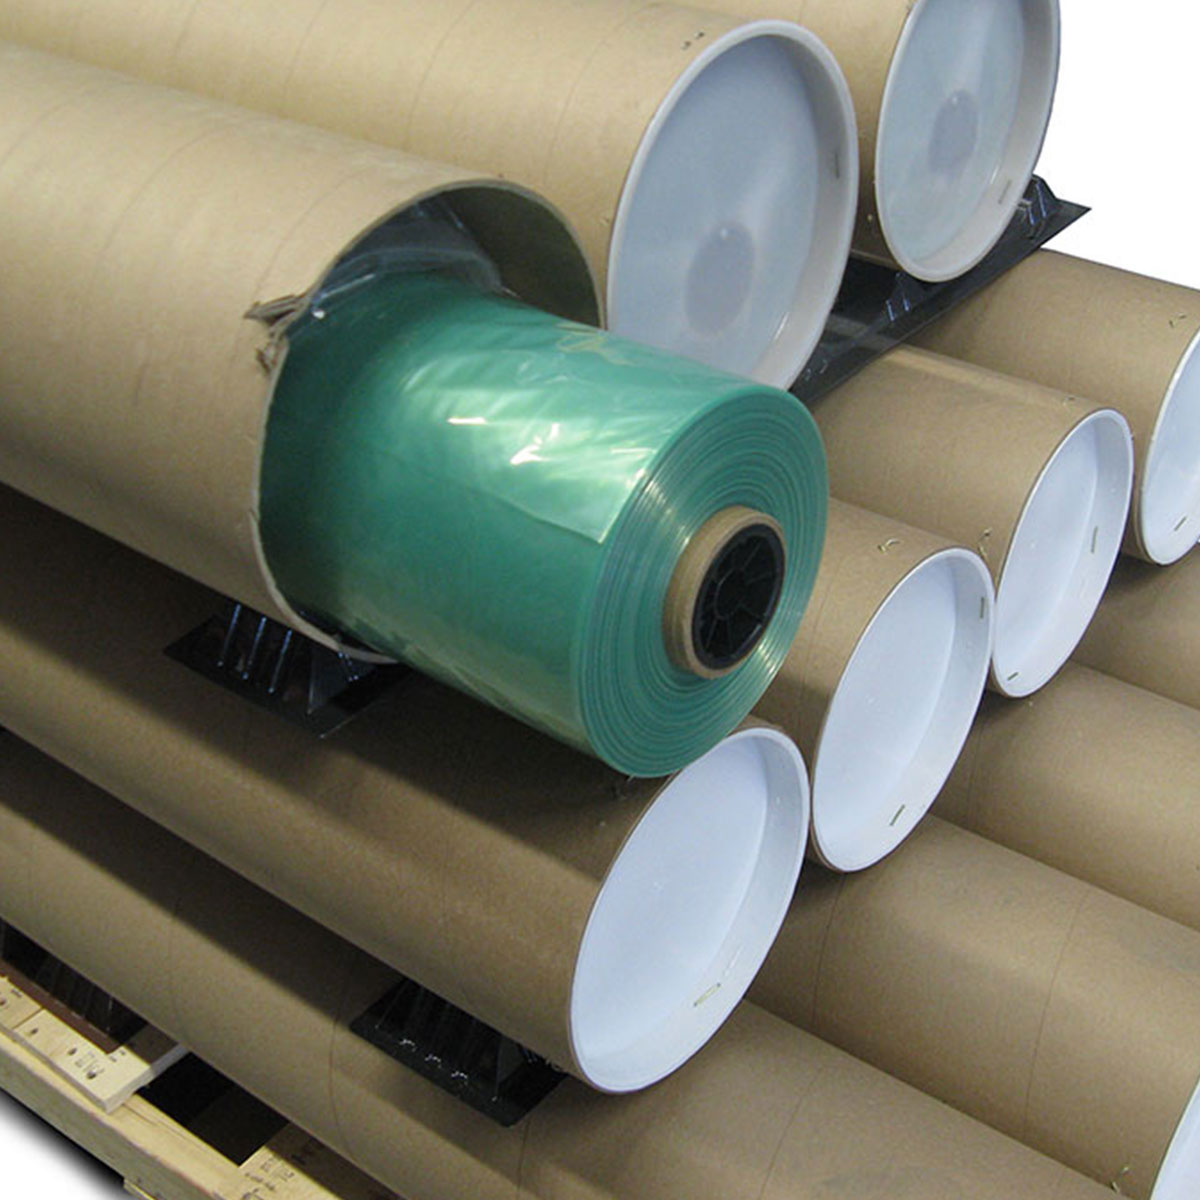 vakuum sack nylon 1300 grn 0005mm x 1300mm 572m 00002 x 50